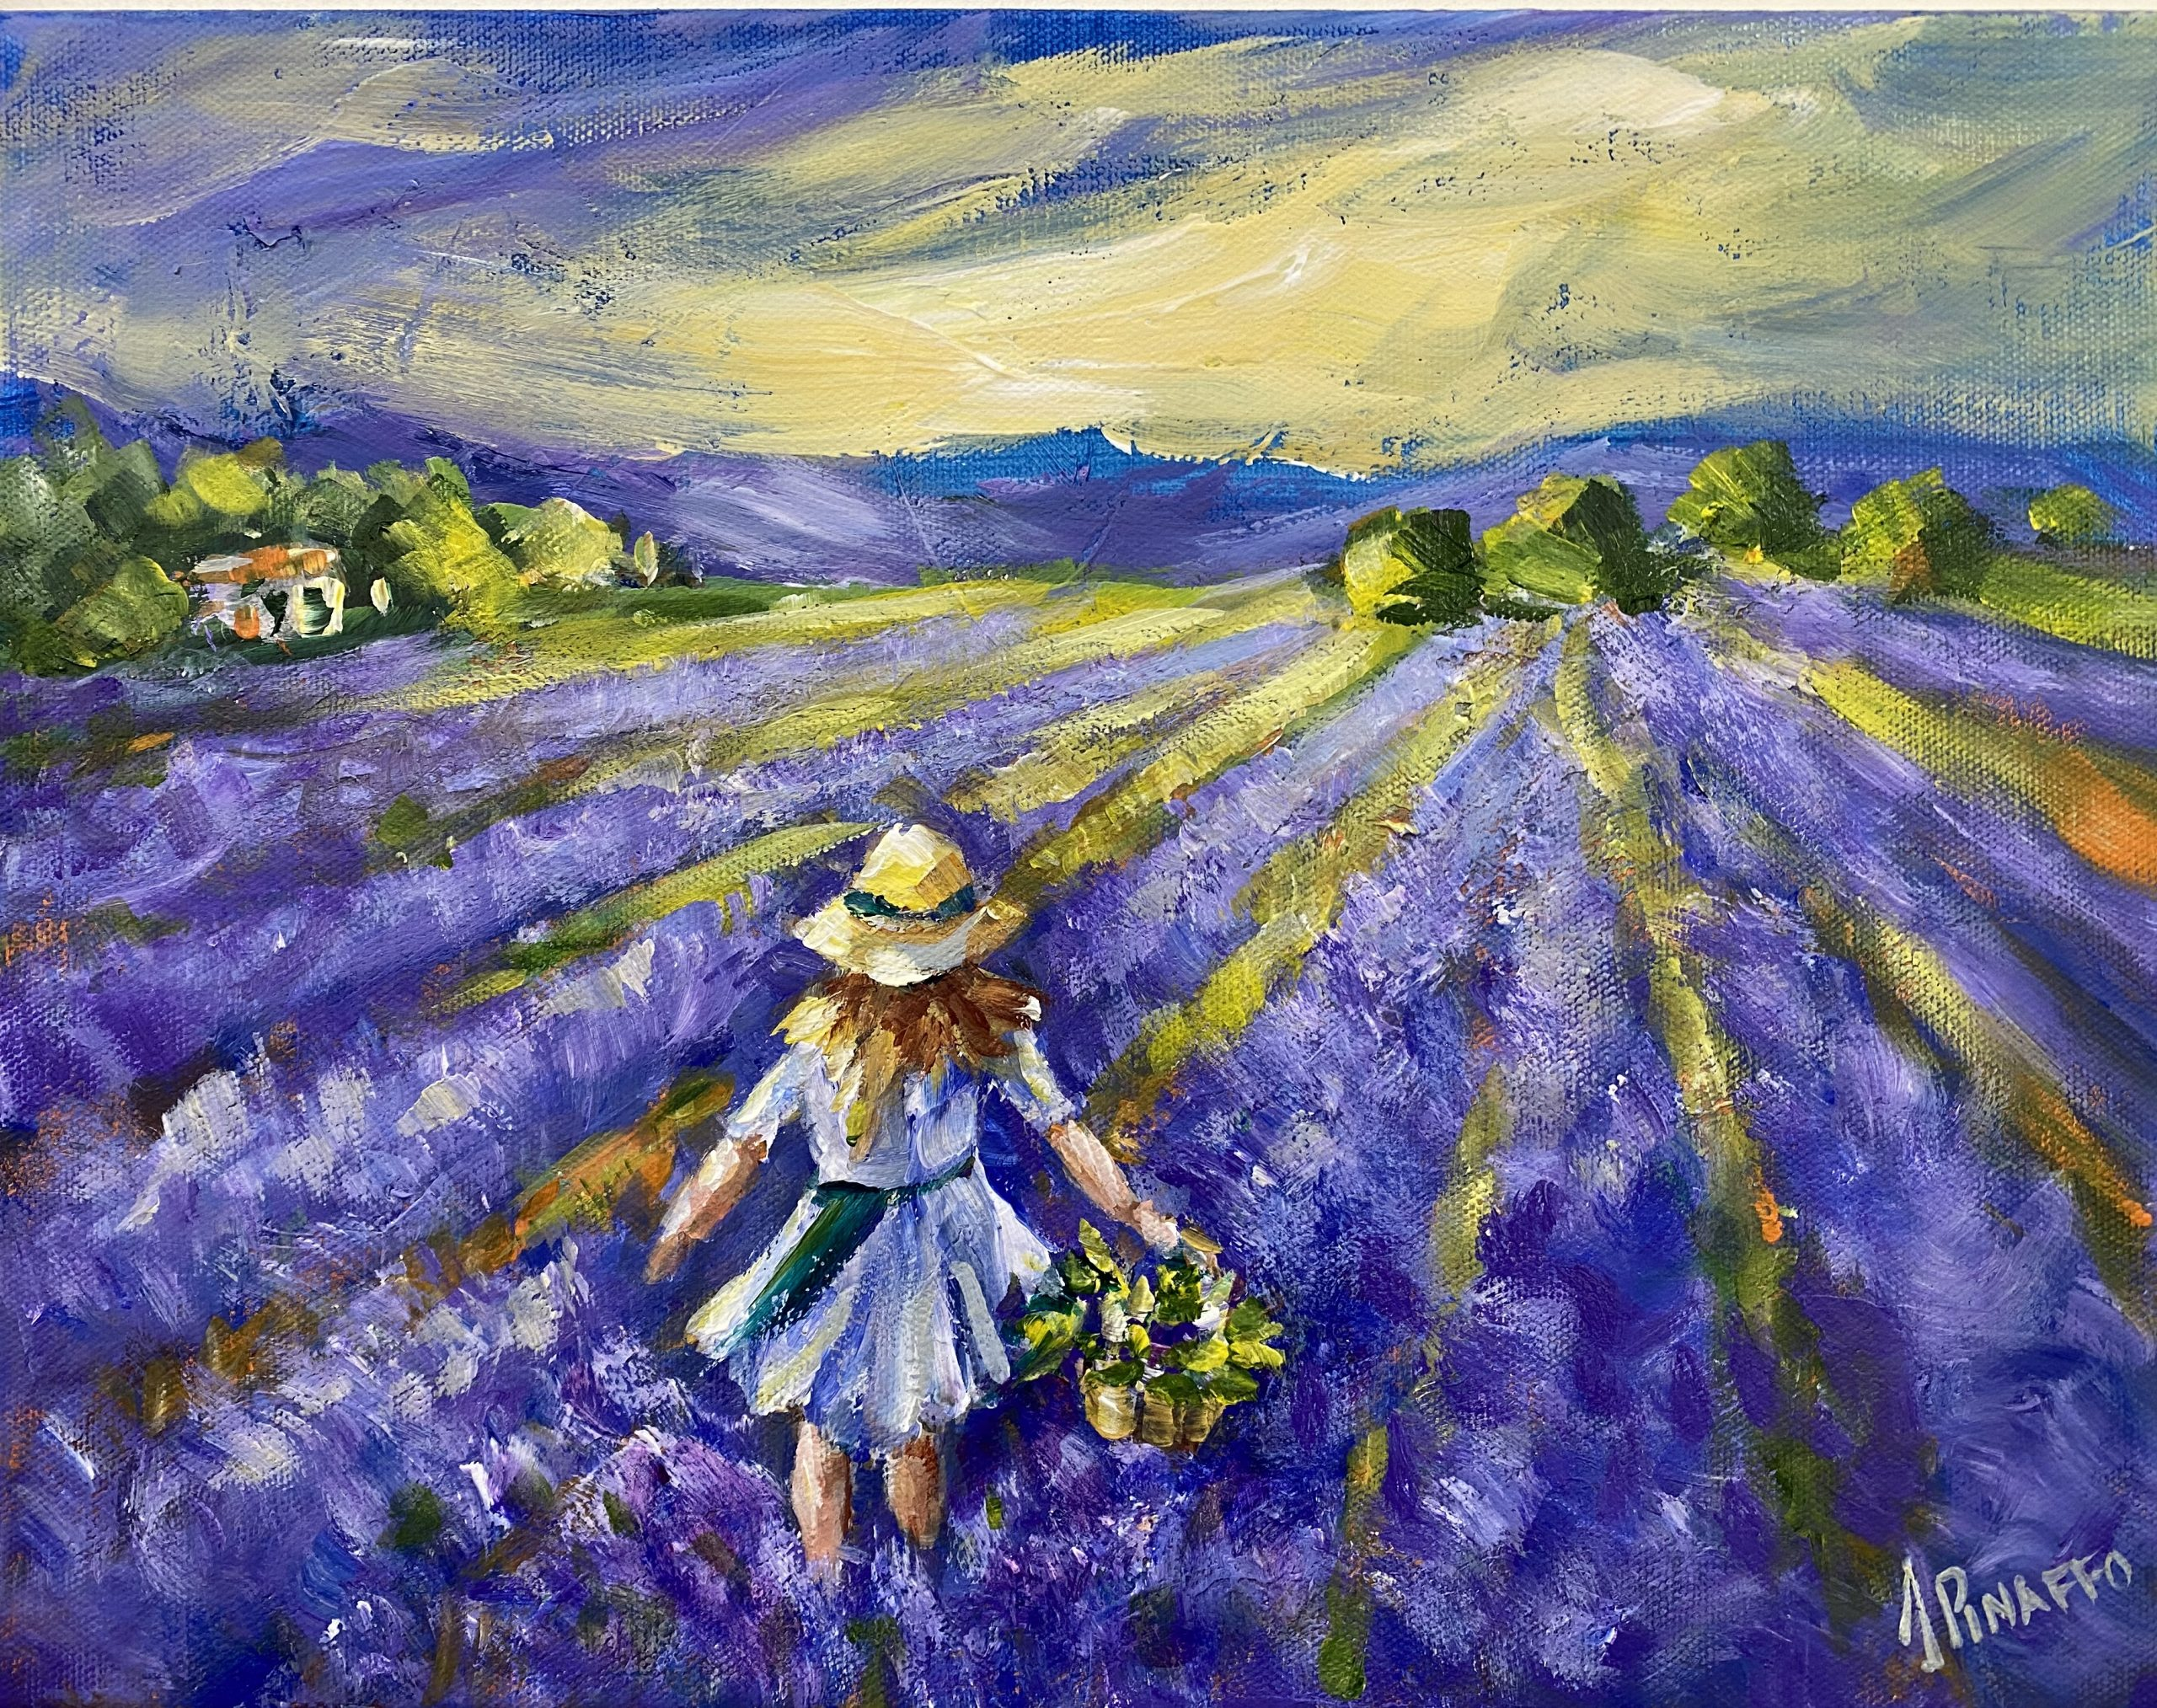 At The Lavender Farm 1